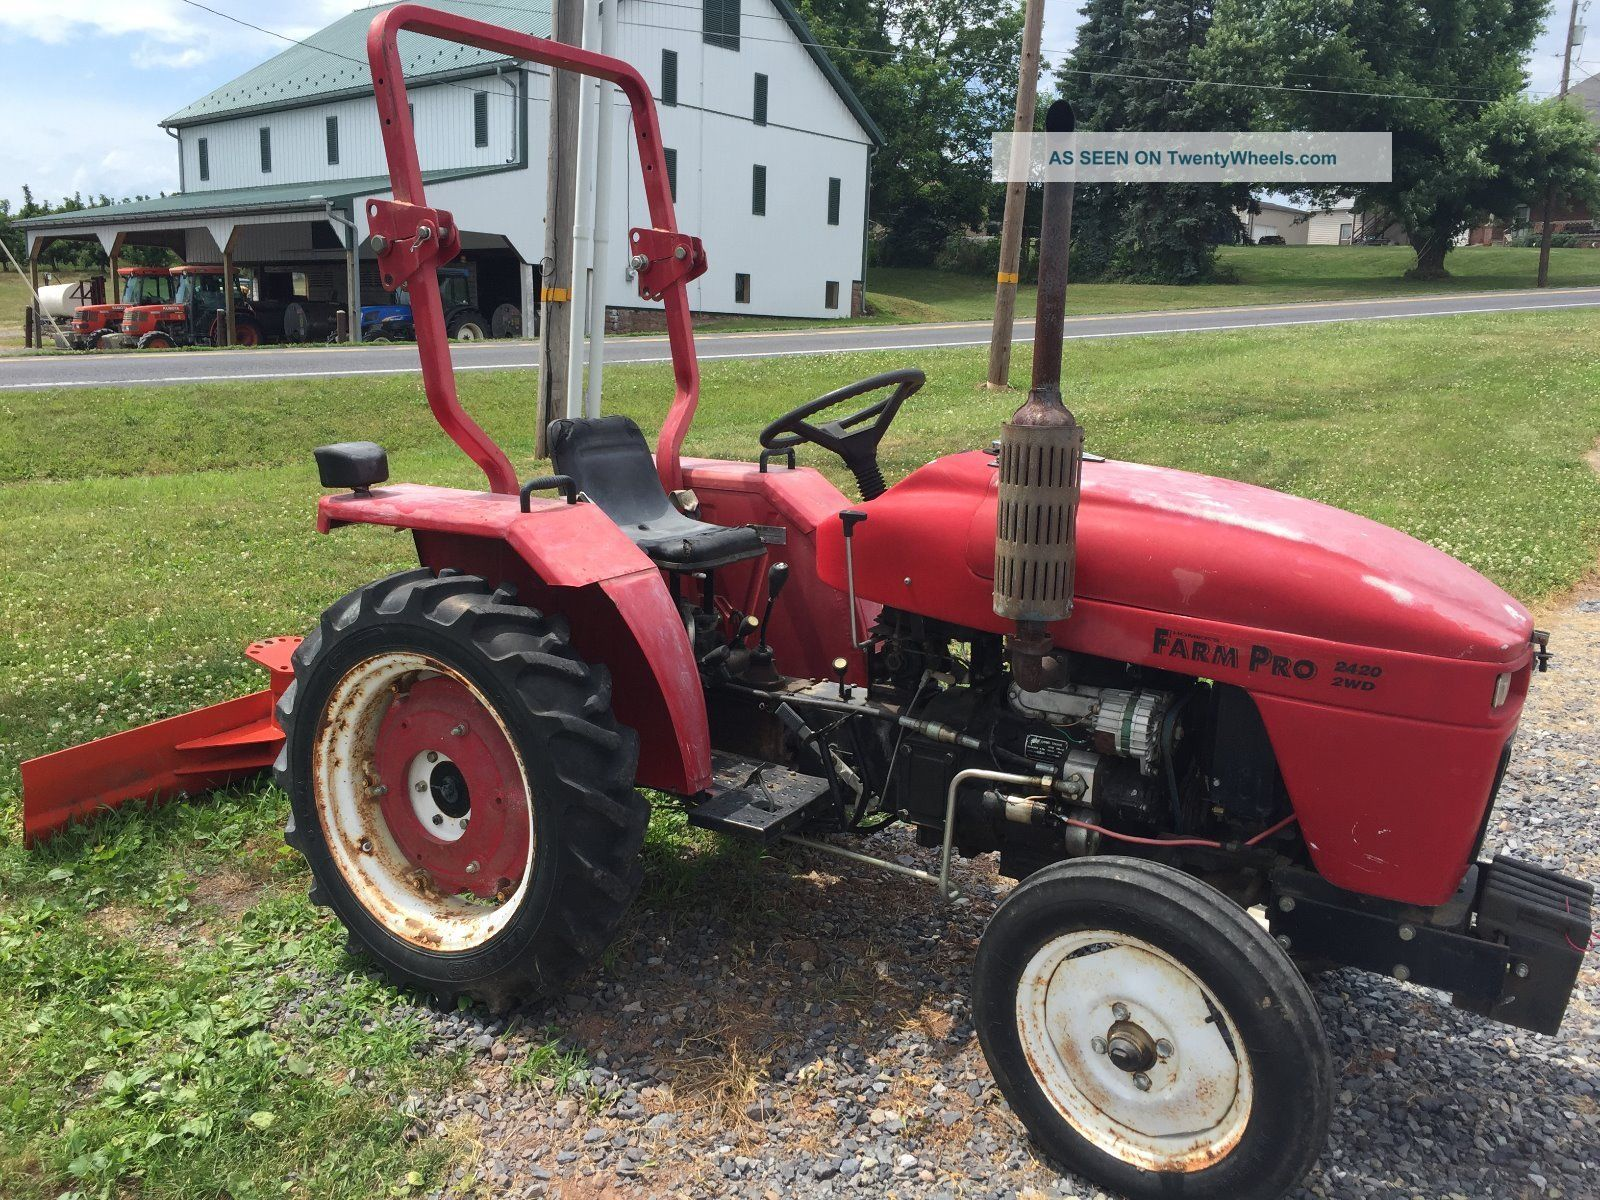 Small Tractors With Pto : Farm pro diesel compact tractor pt pto